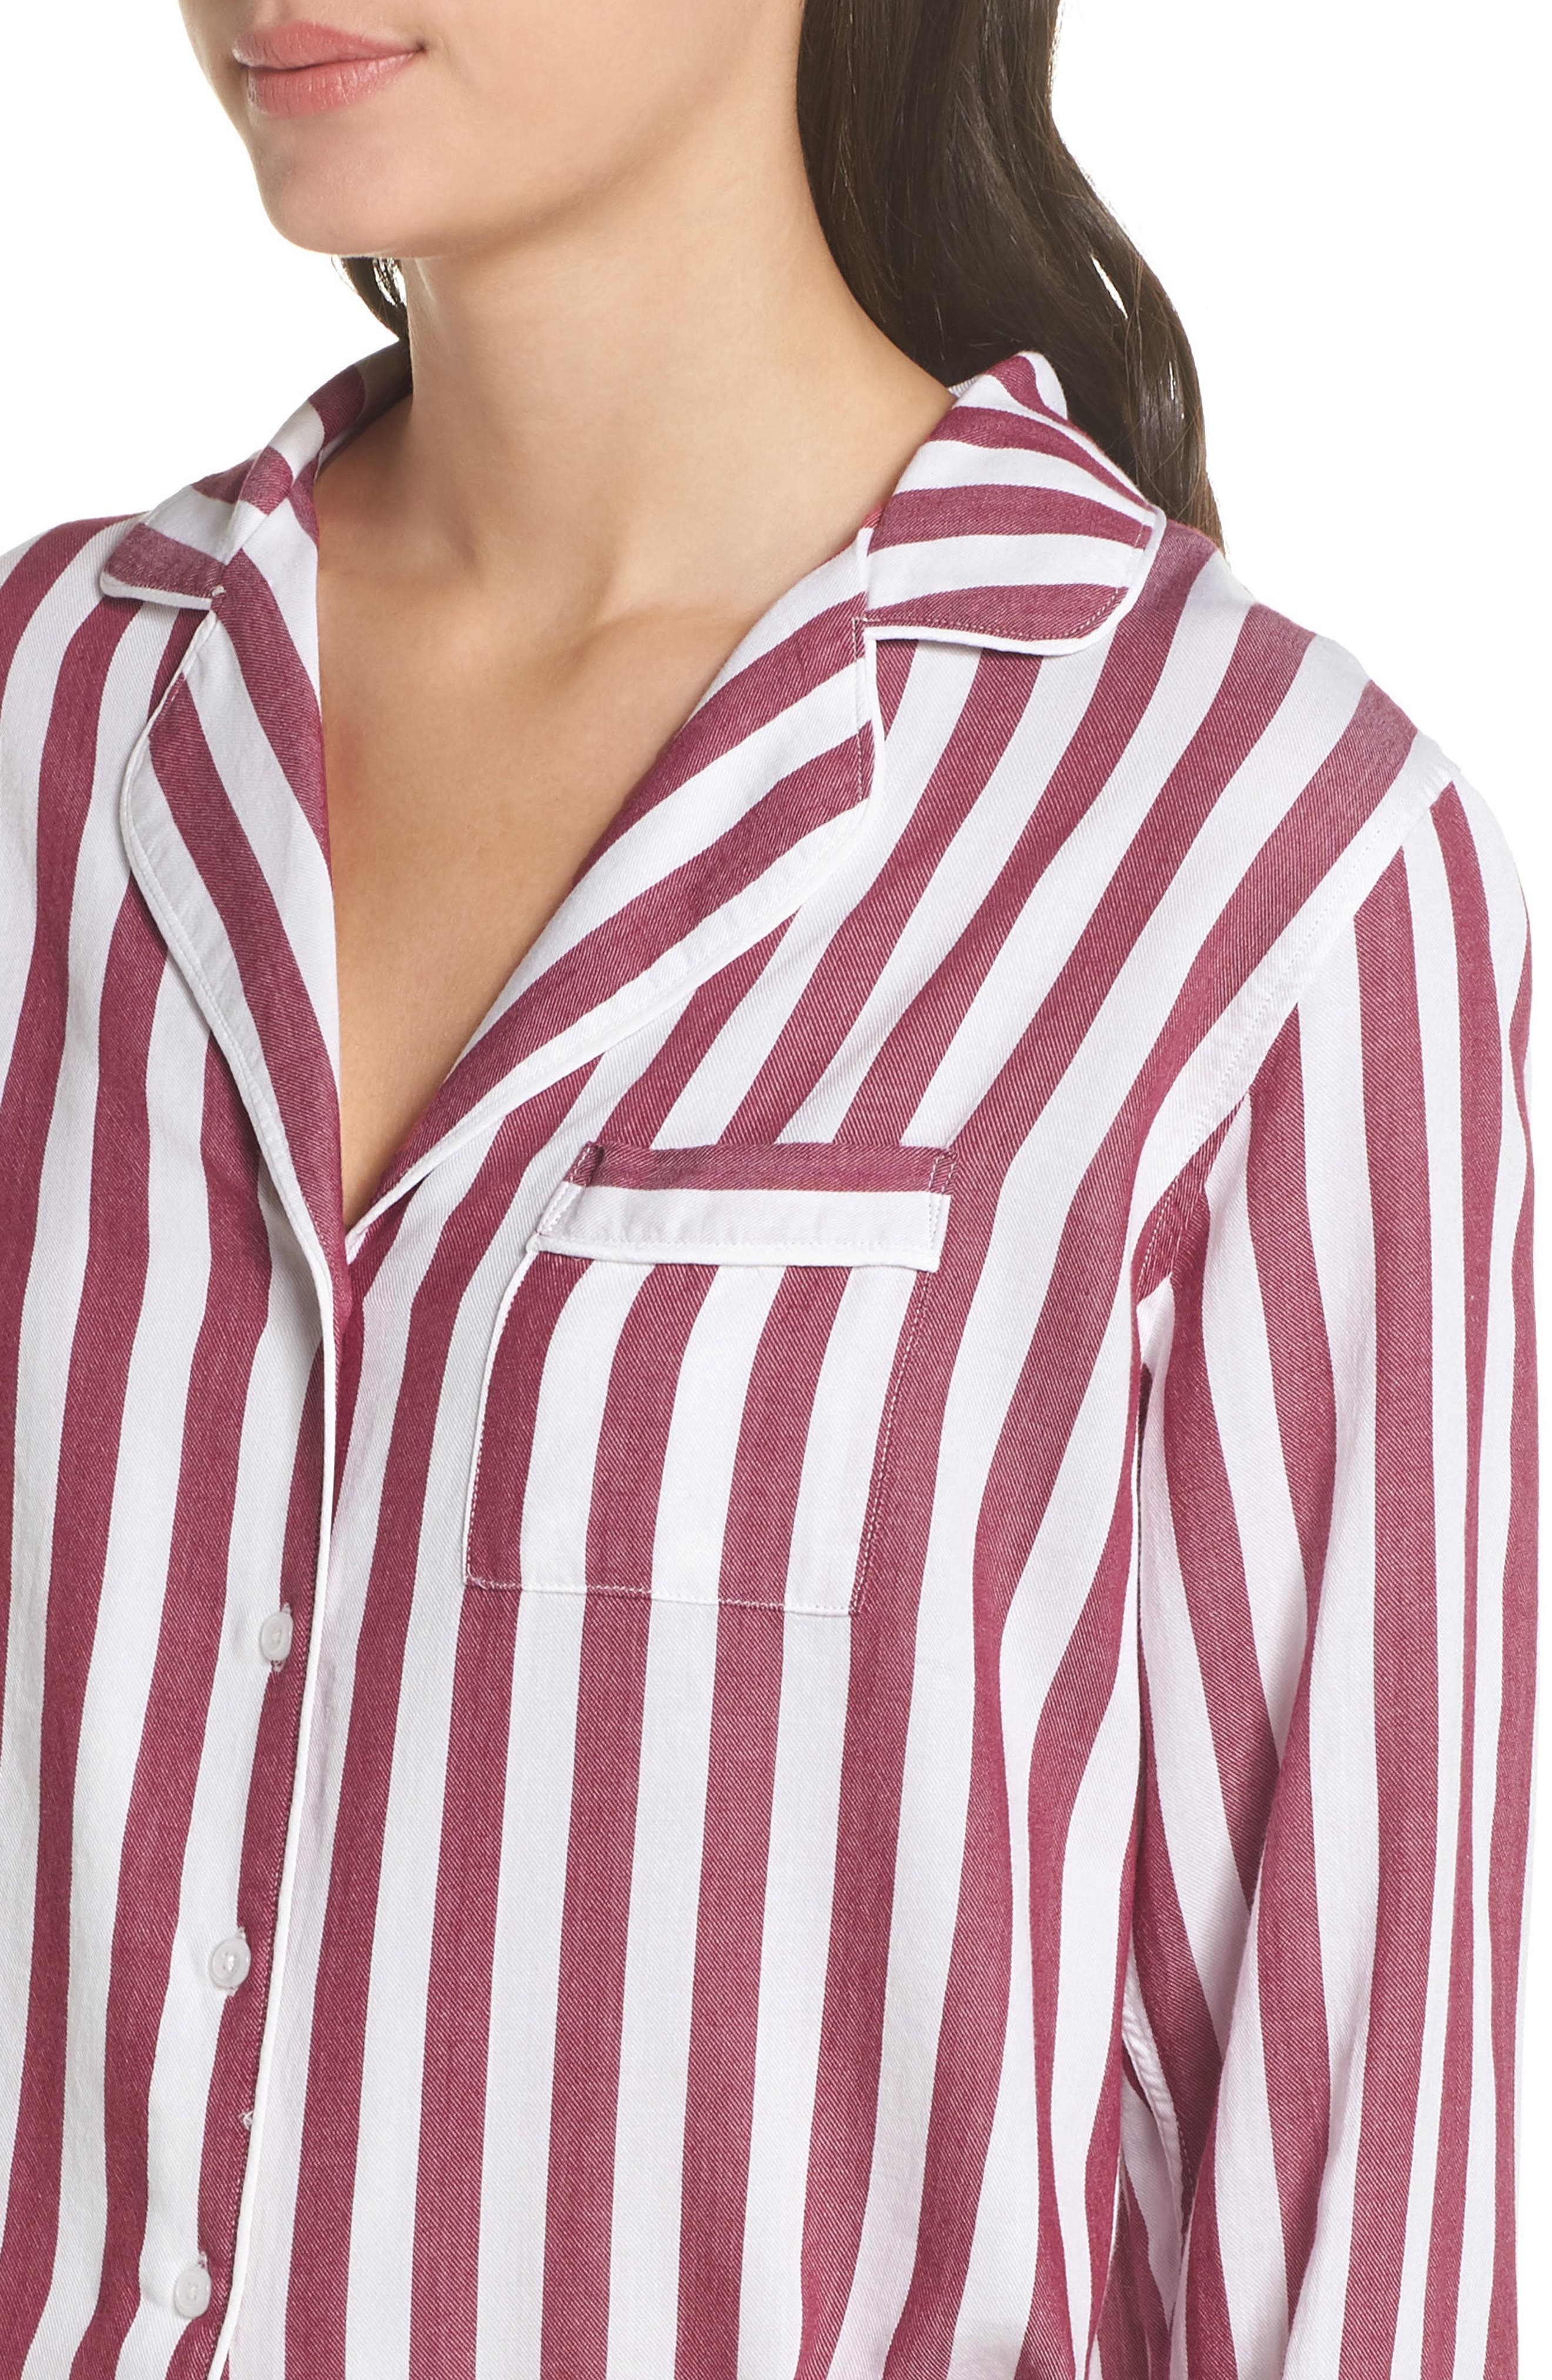 Stripe Short Pajamas,                             Alternate thumbnail 4, color,                             TOLEDO STRIPE